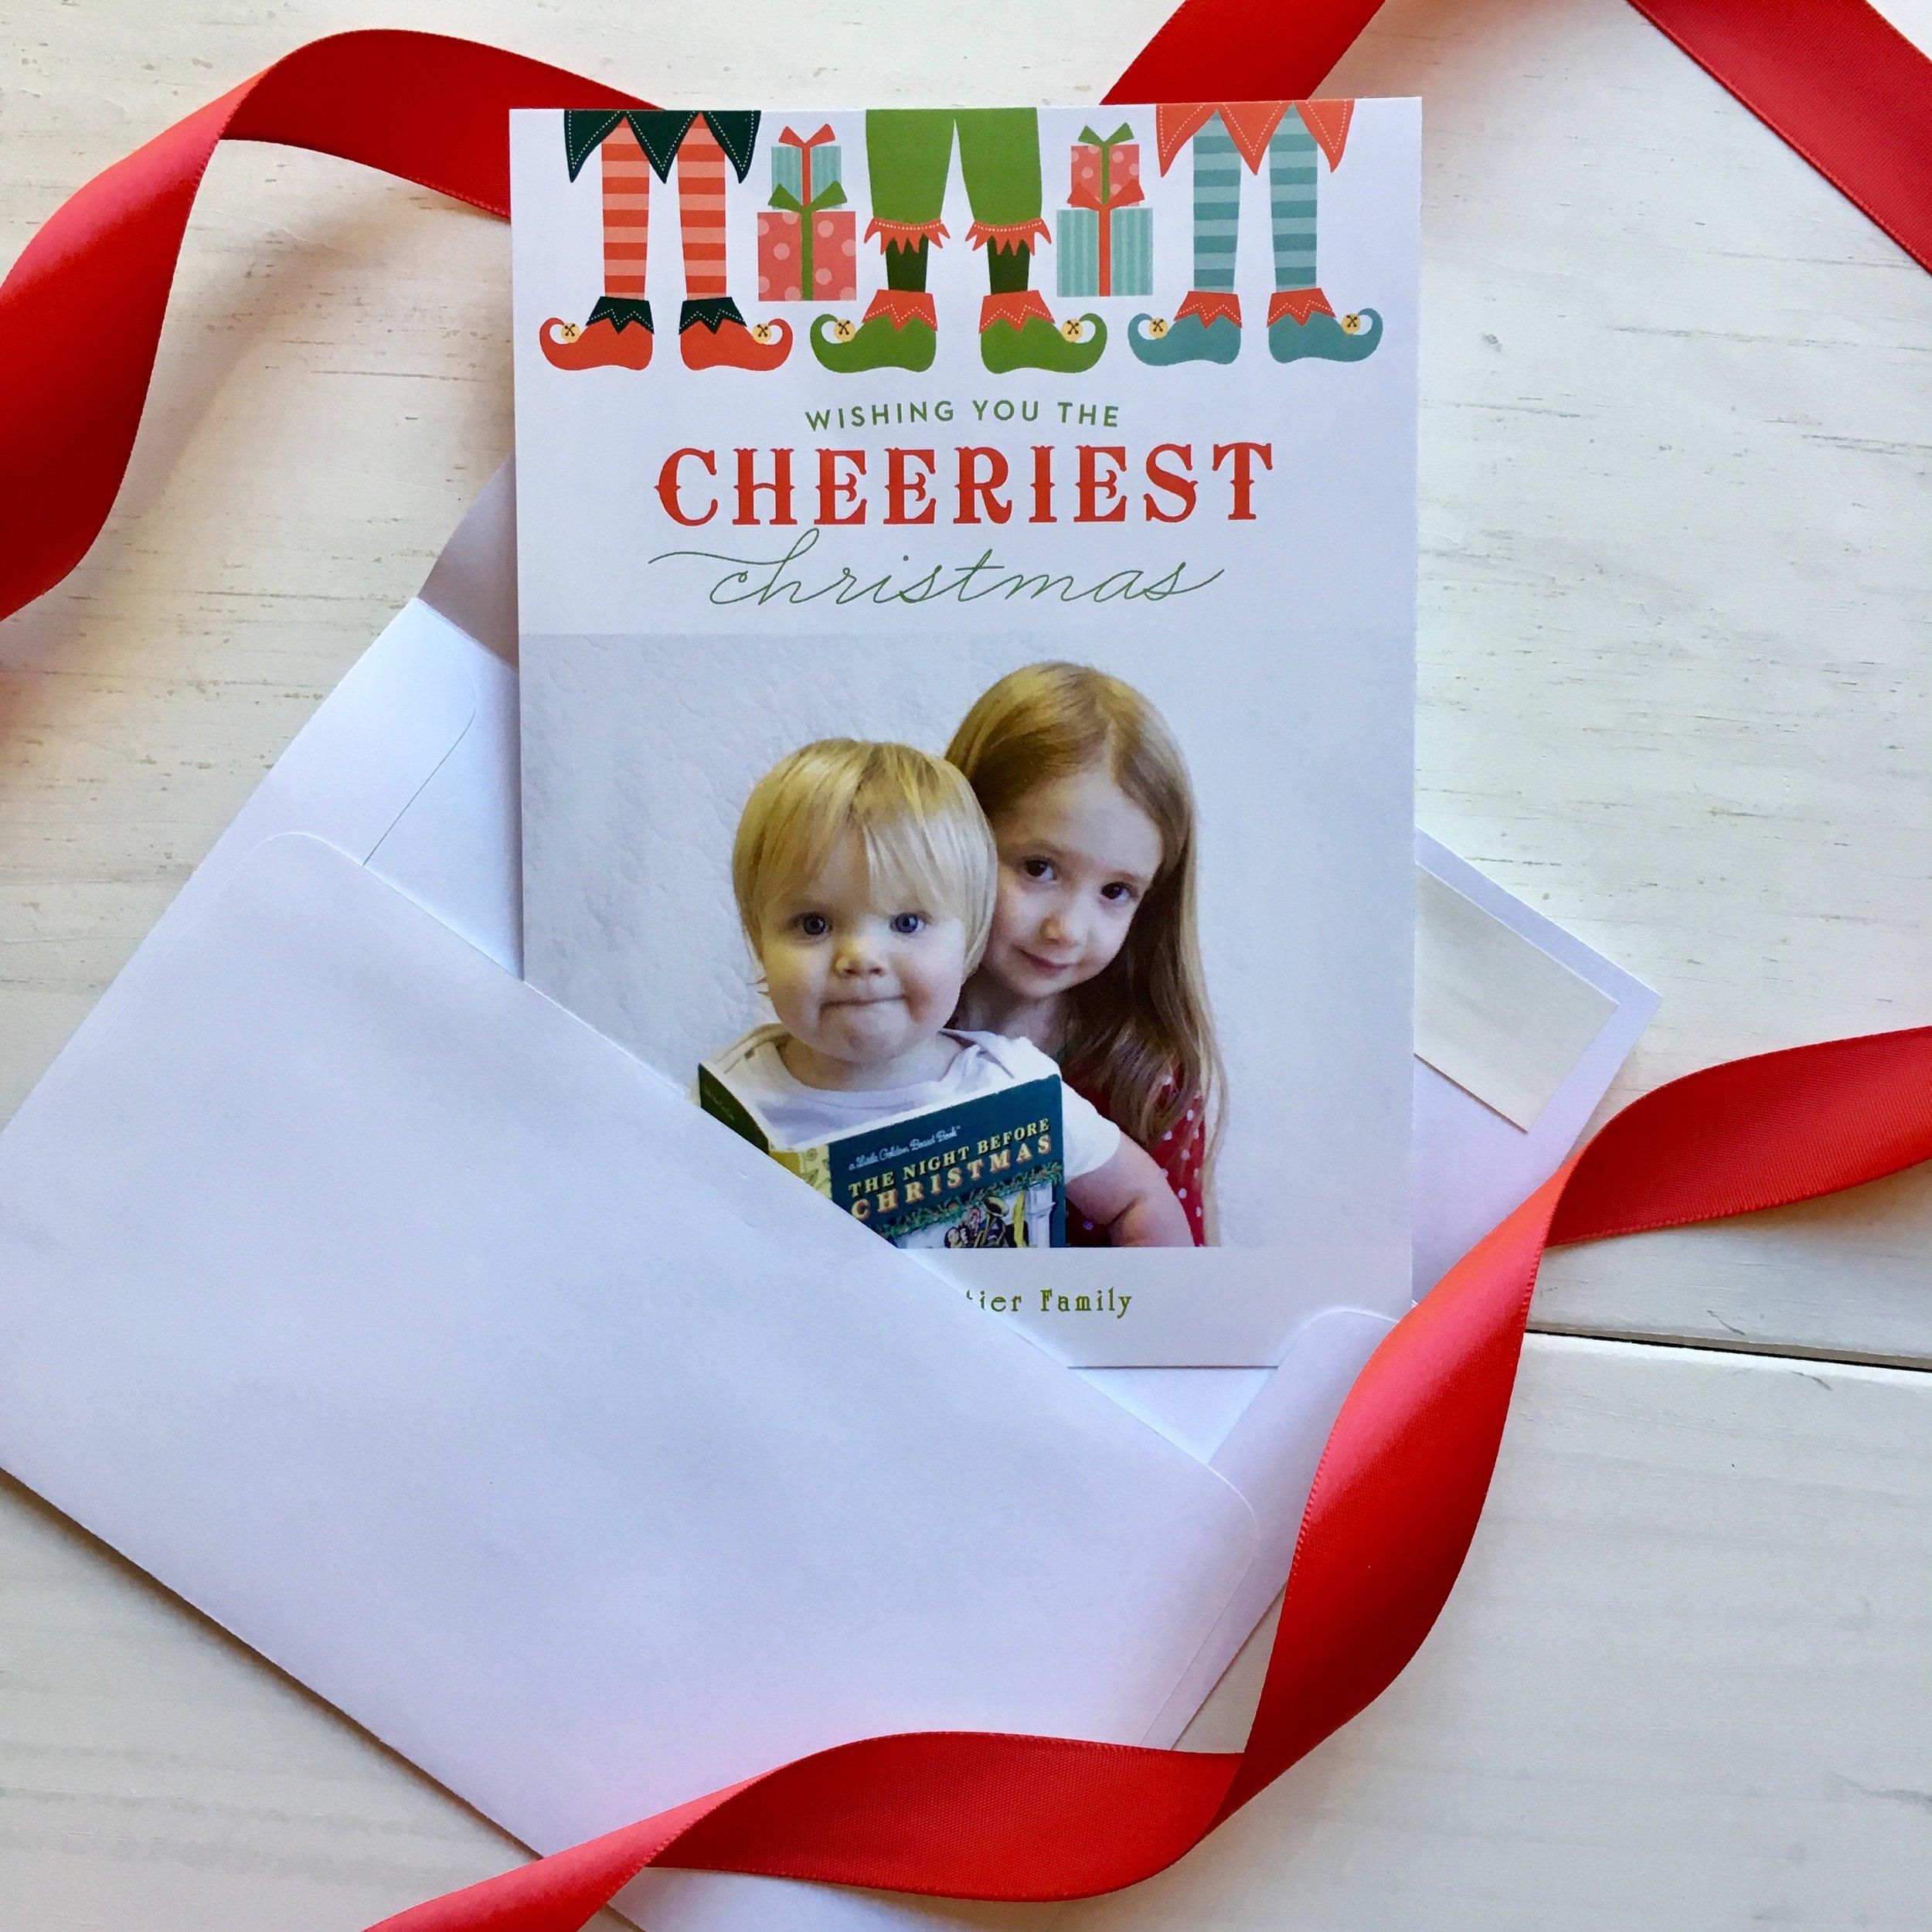 Our Christmas Card!